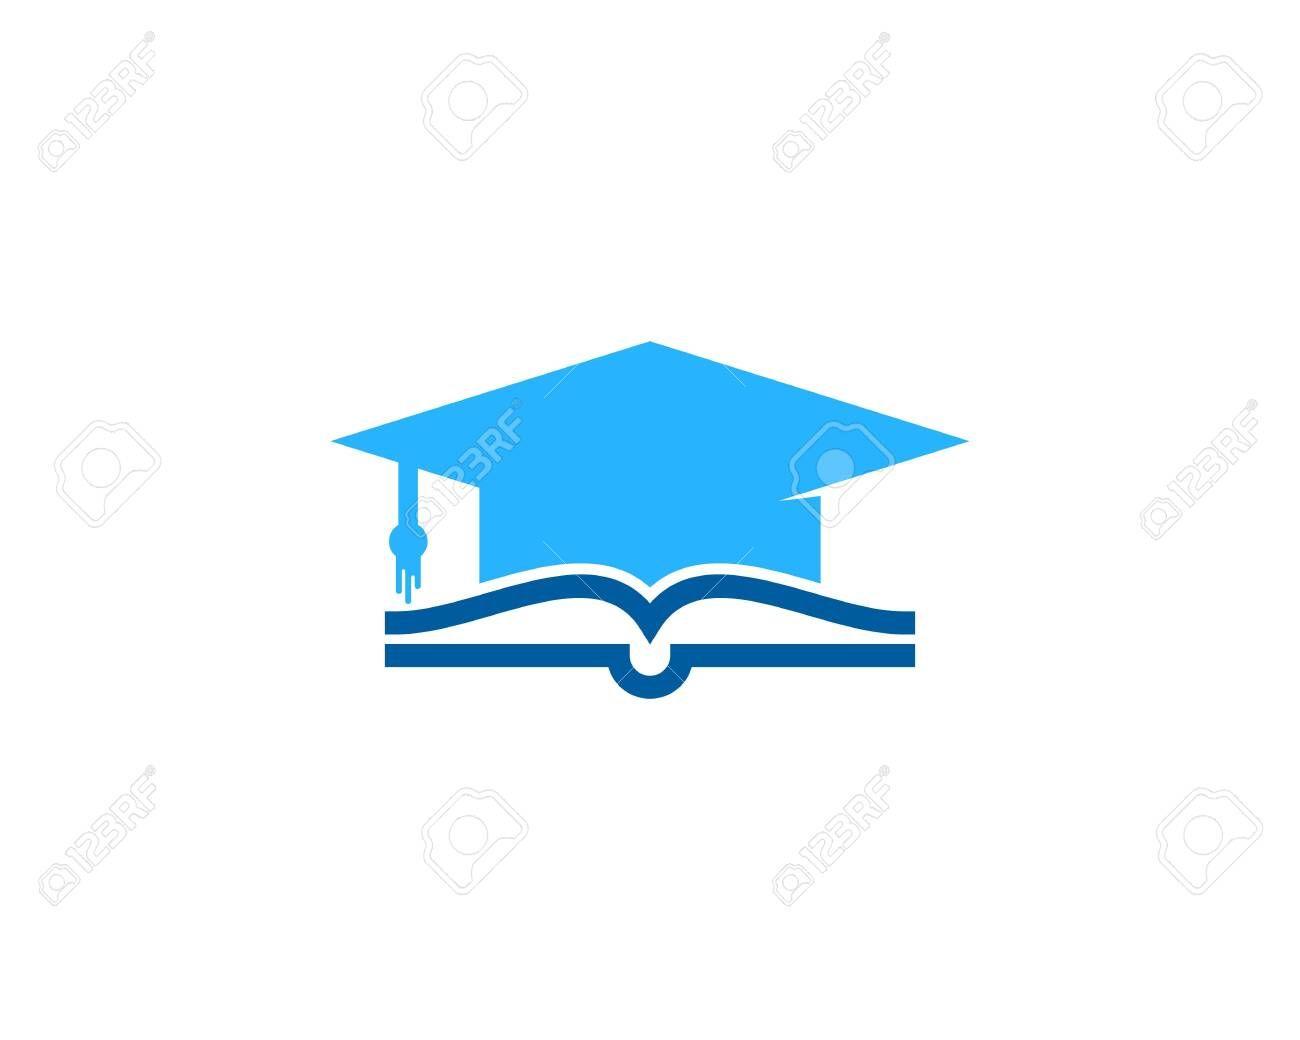 Study Book Logo Icon Design Illustration Ad Logo Book Study Illustration Design In 2020 Book Logo Icon Design Illustration Design